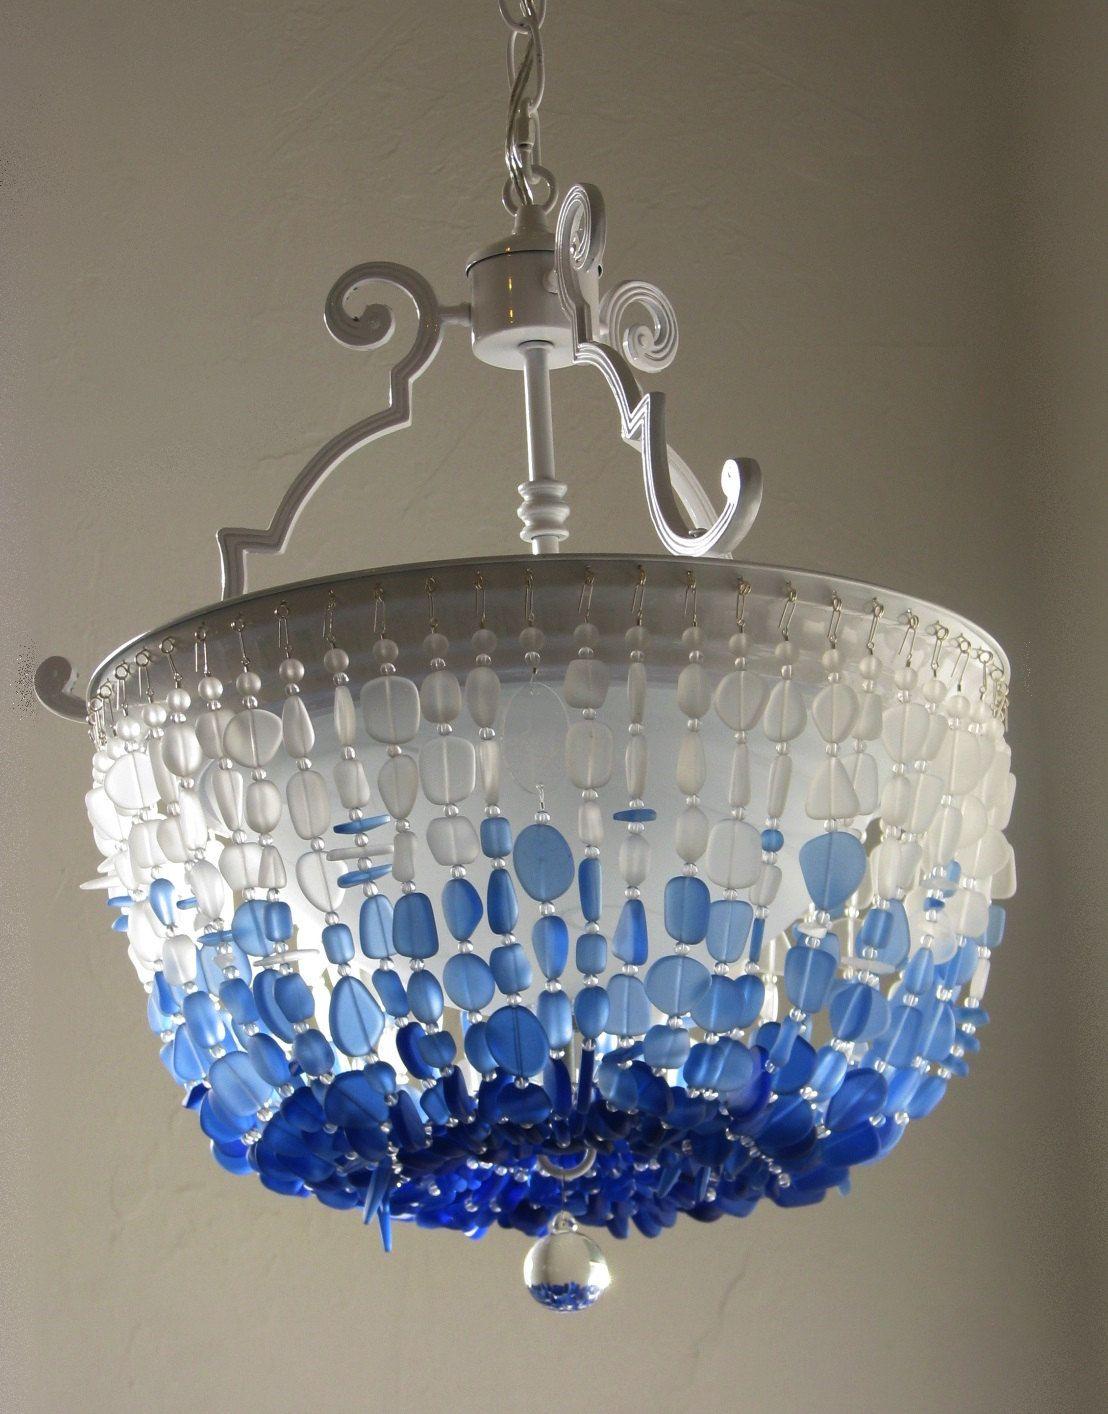 Sea glass chandelier semi flush mount coastal decor beach glass ceiling fixture the nantucket sound by coastalradiancelites on etsy